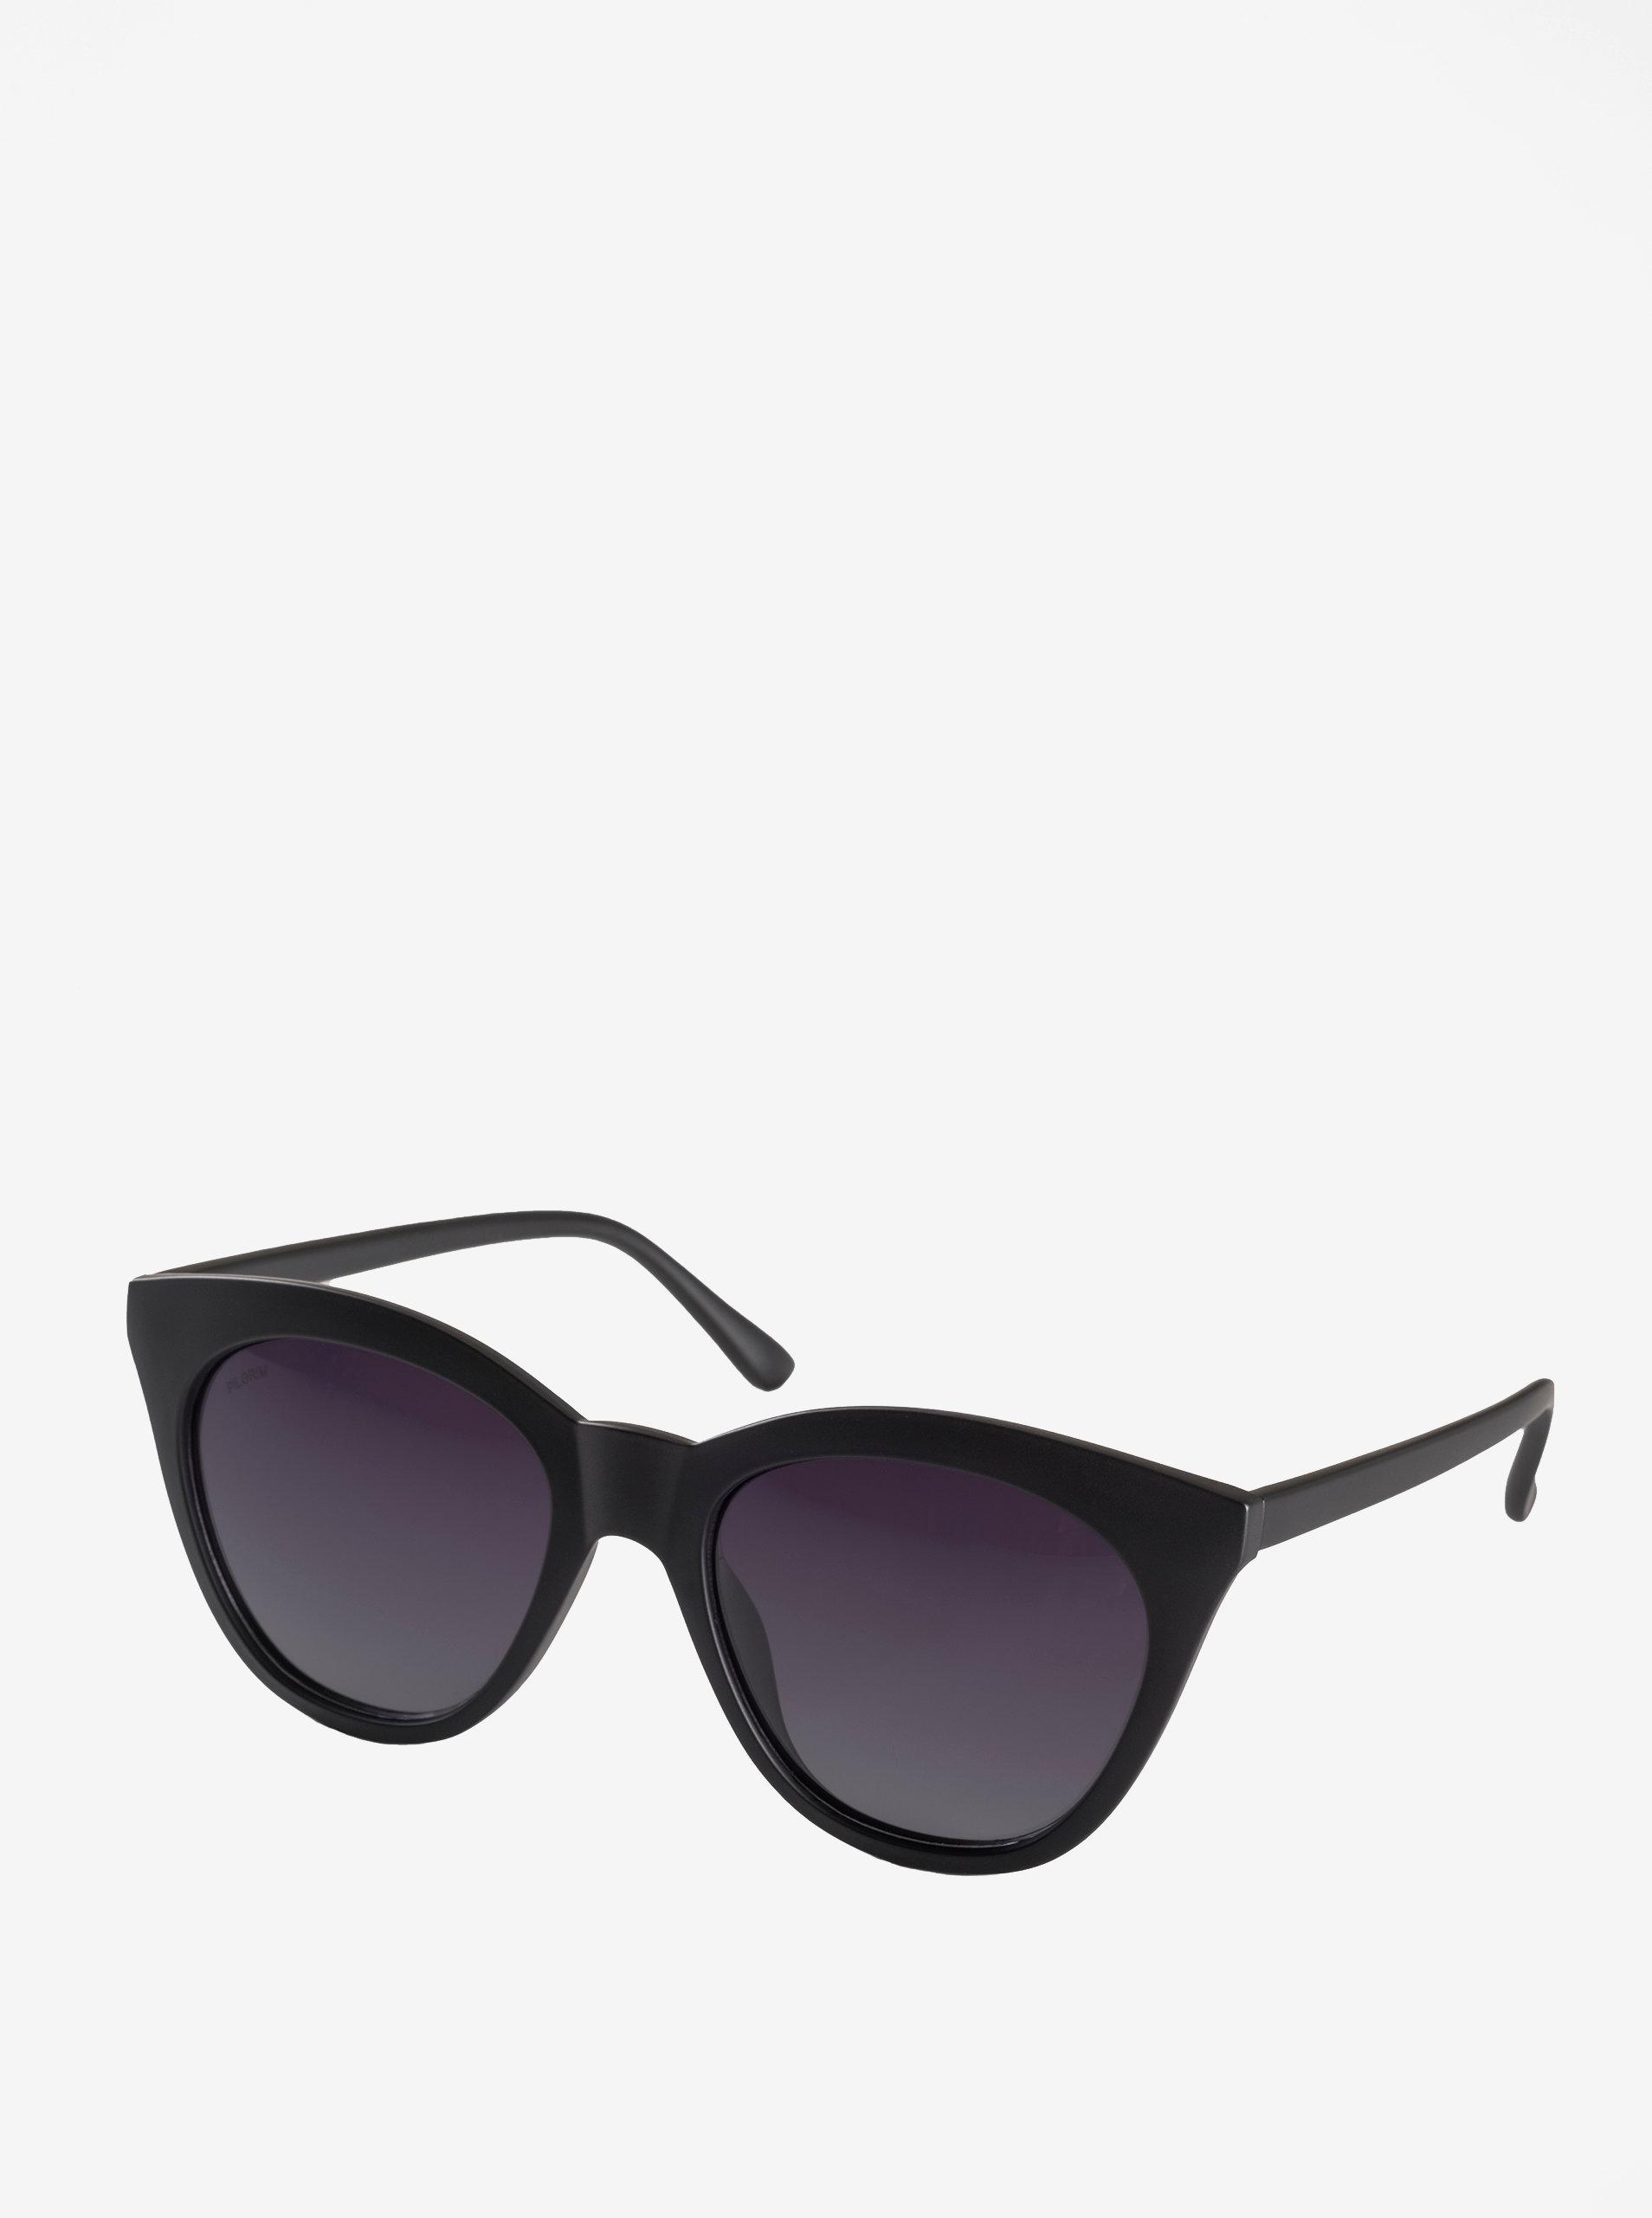 Čierne dámske slnečné okuliare Pilgrim Ivy ... 0de2affc647